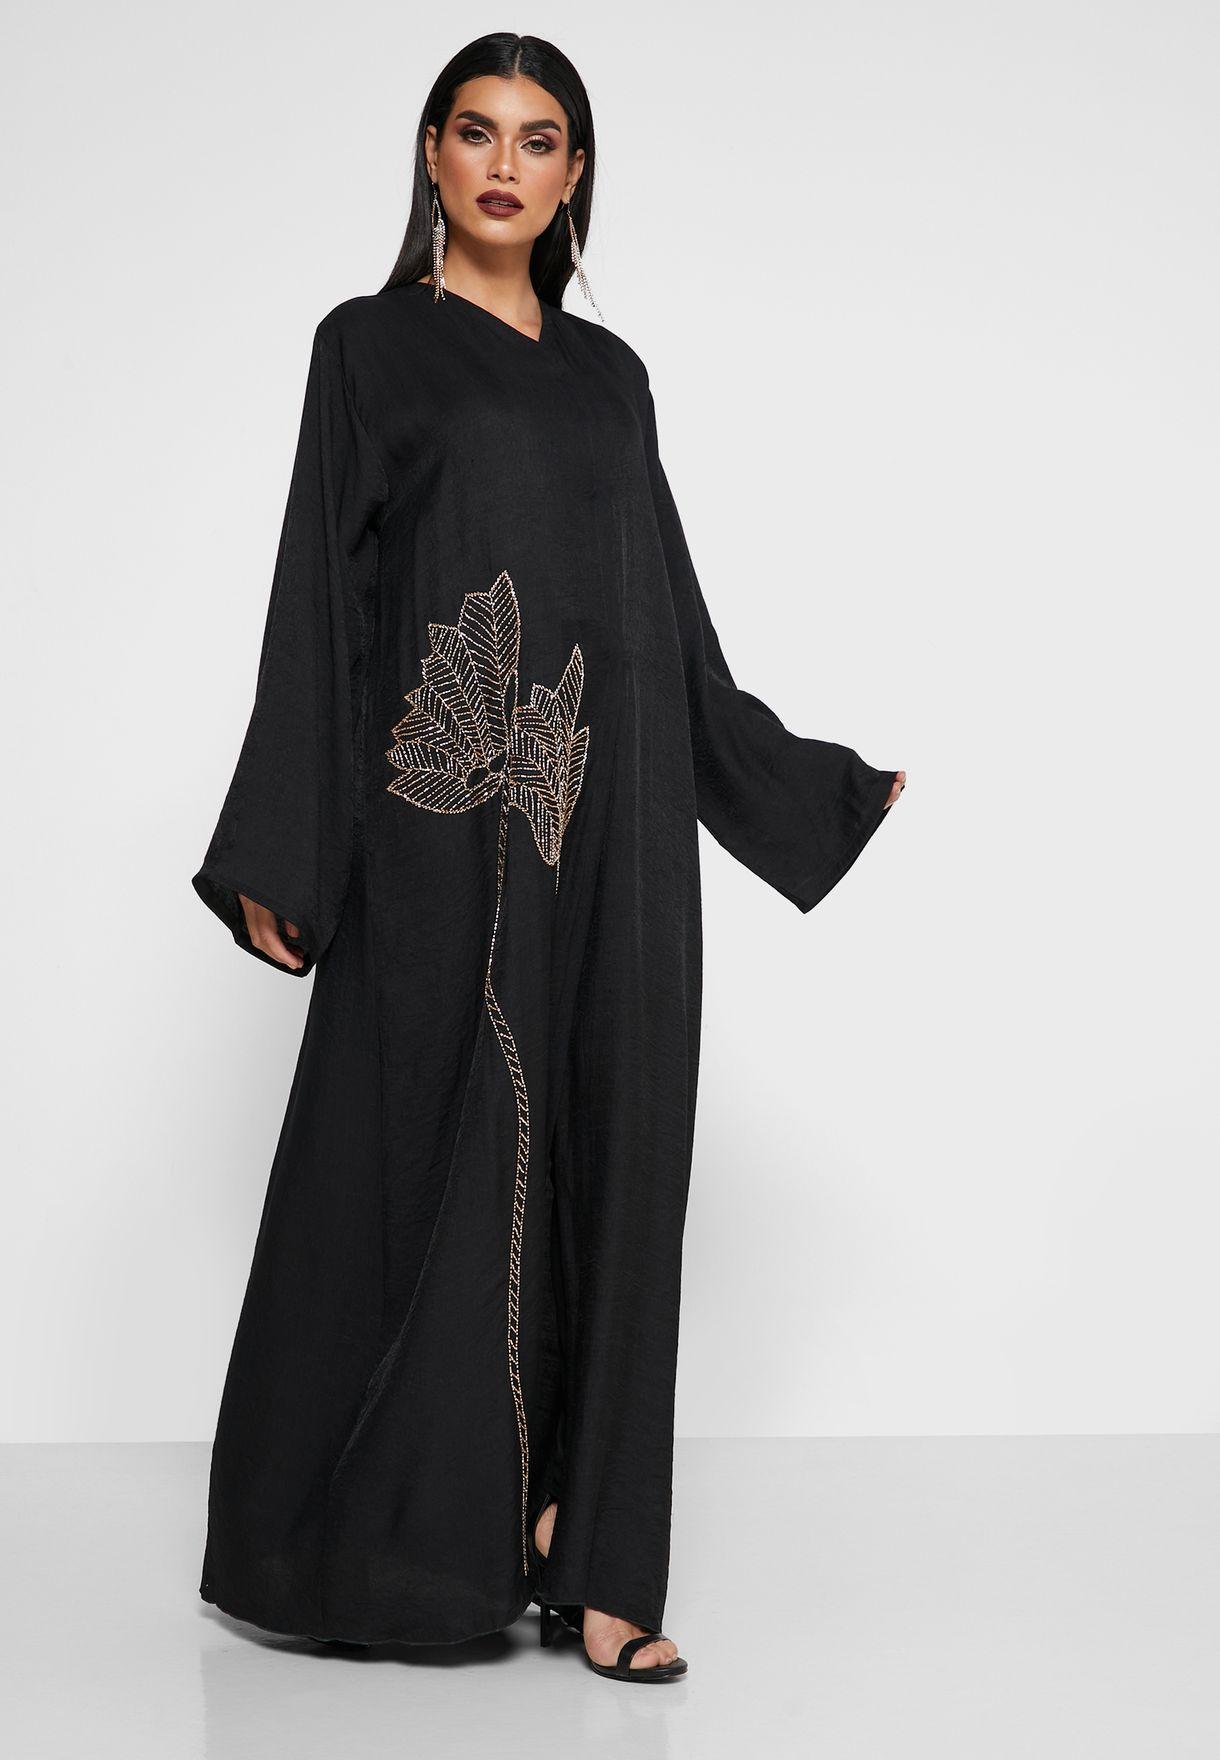 Floral Print Abaya